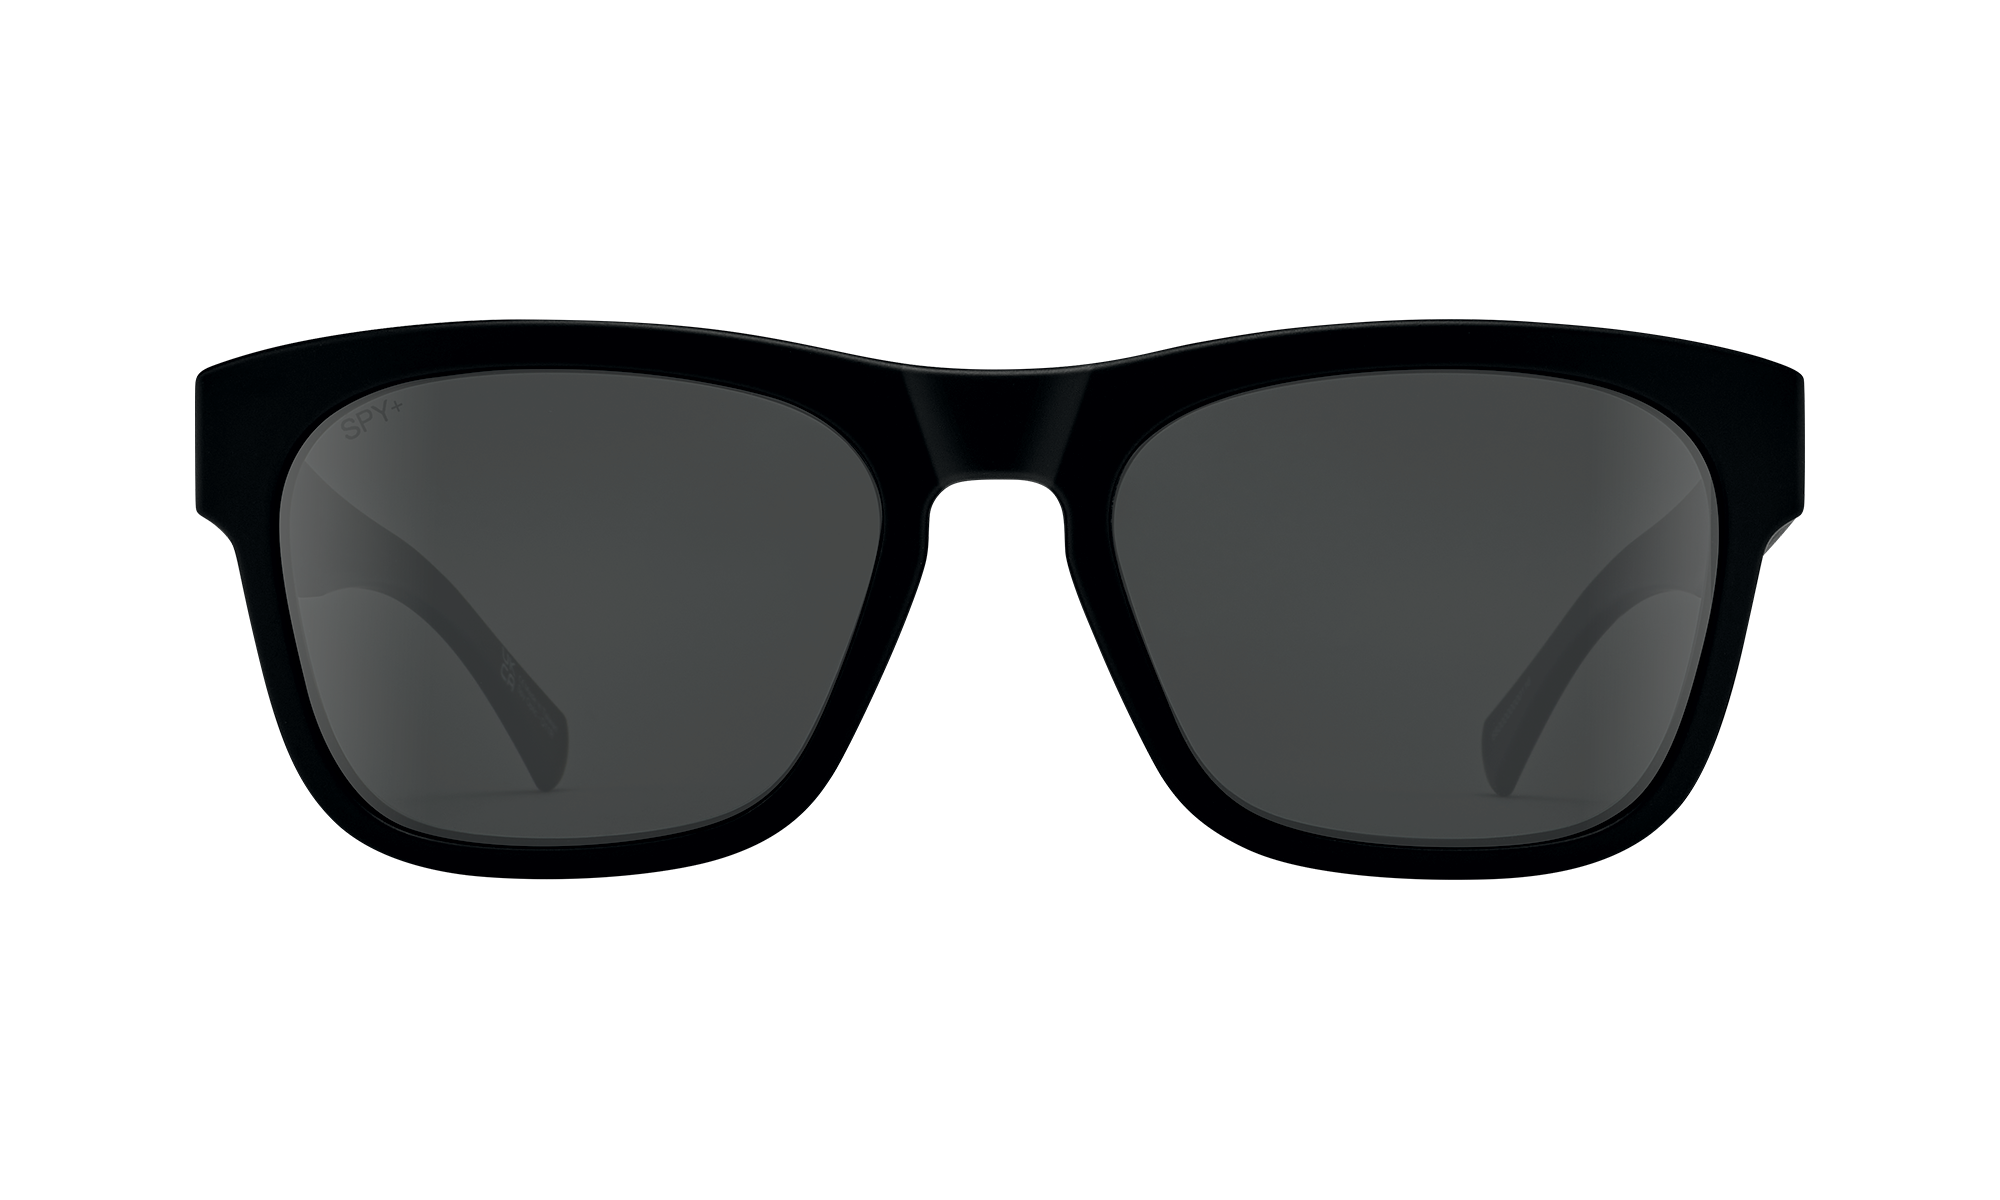 SPY Spy Crossway Sunglasses